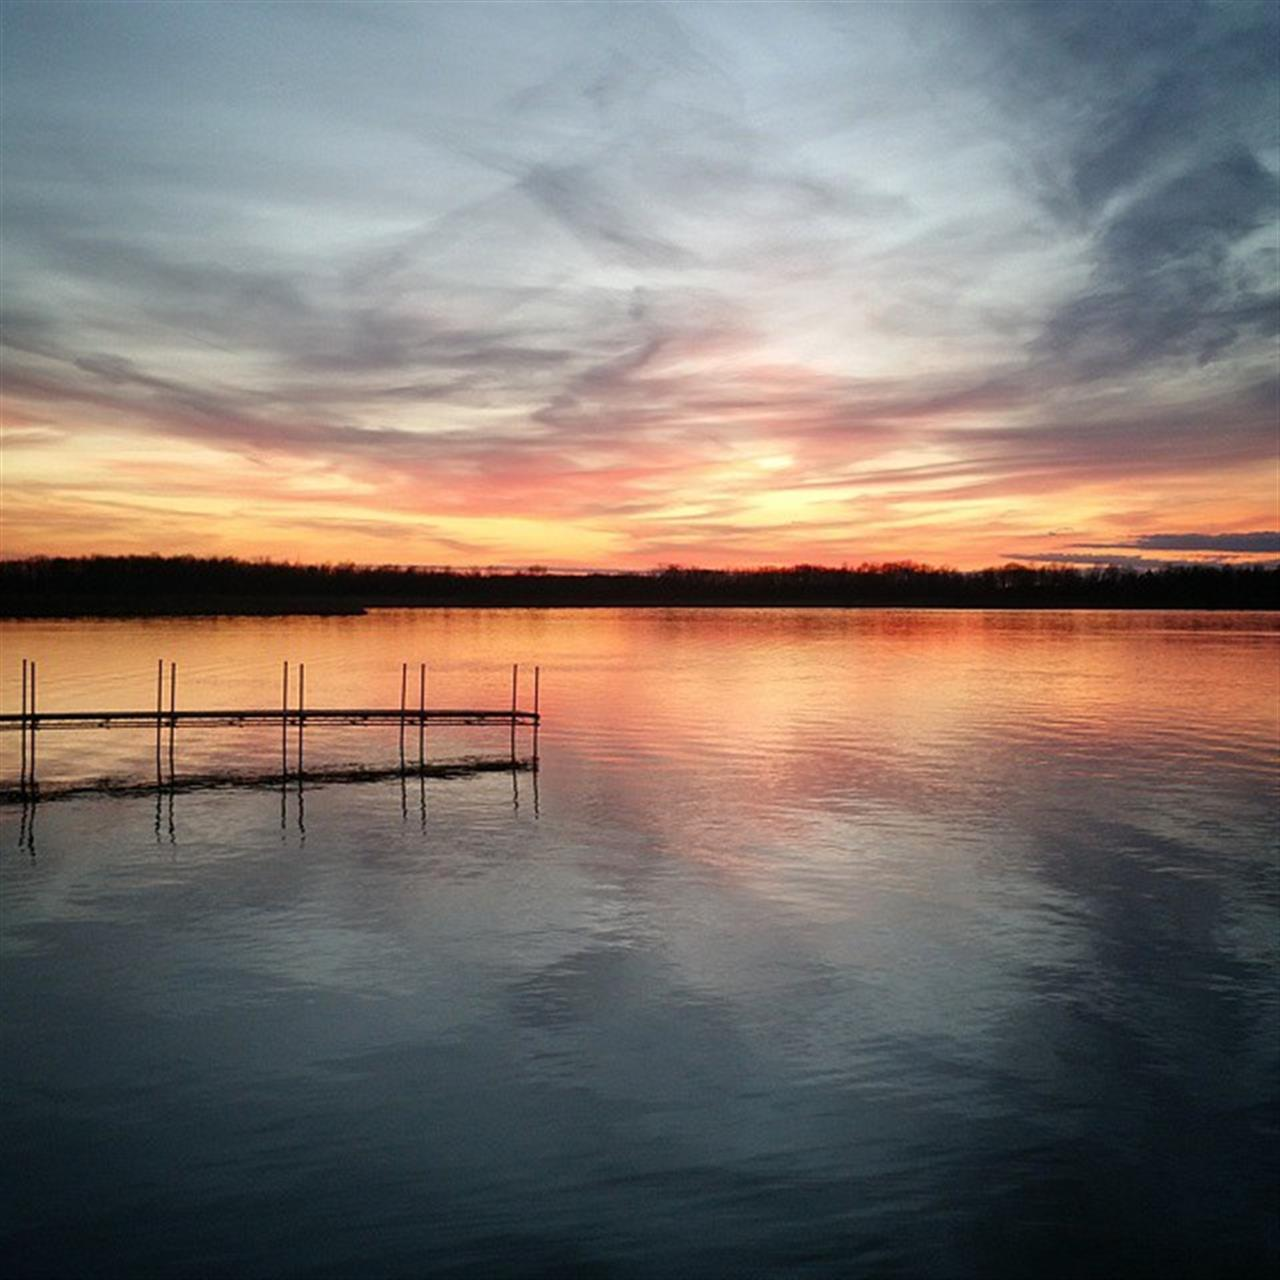 #sunset #rochesterny #leadingrelocal